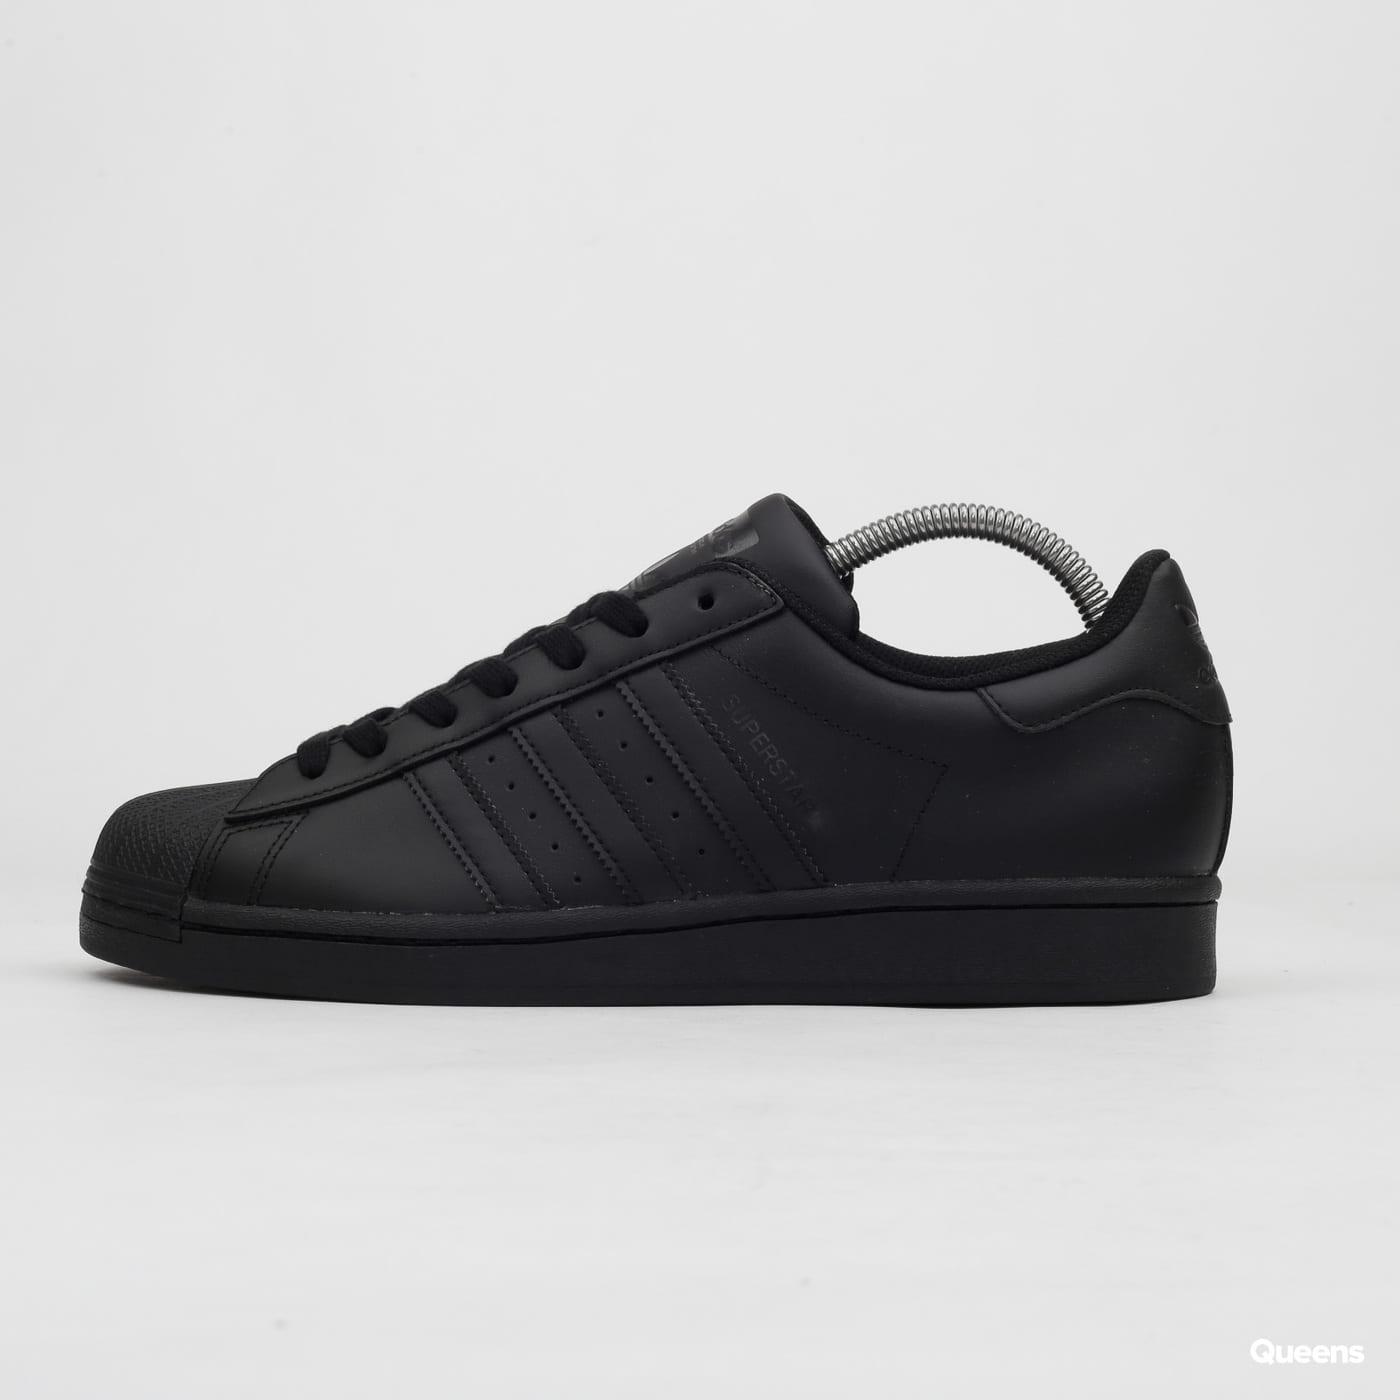 adidas Originals Superstar cblack / cblack / cblack